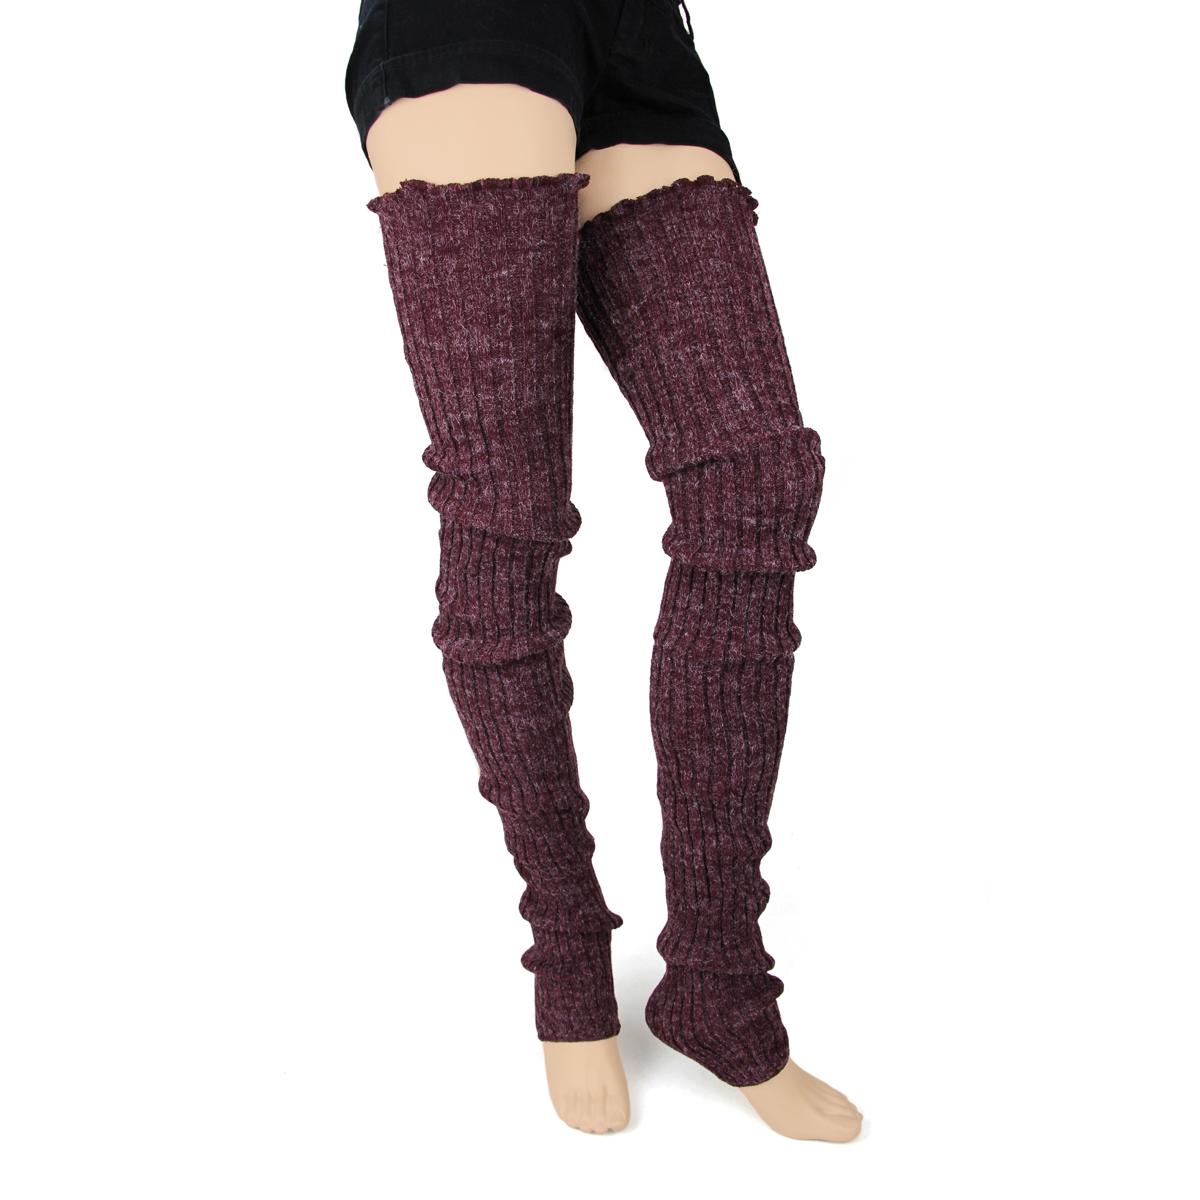 fe3d2c8eb38d4 Super Long Leg Warmers, Legwear: Foot Traffic